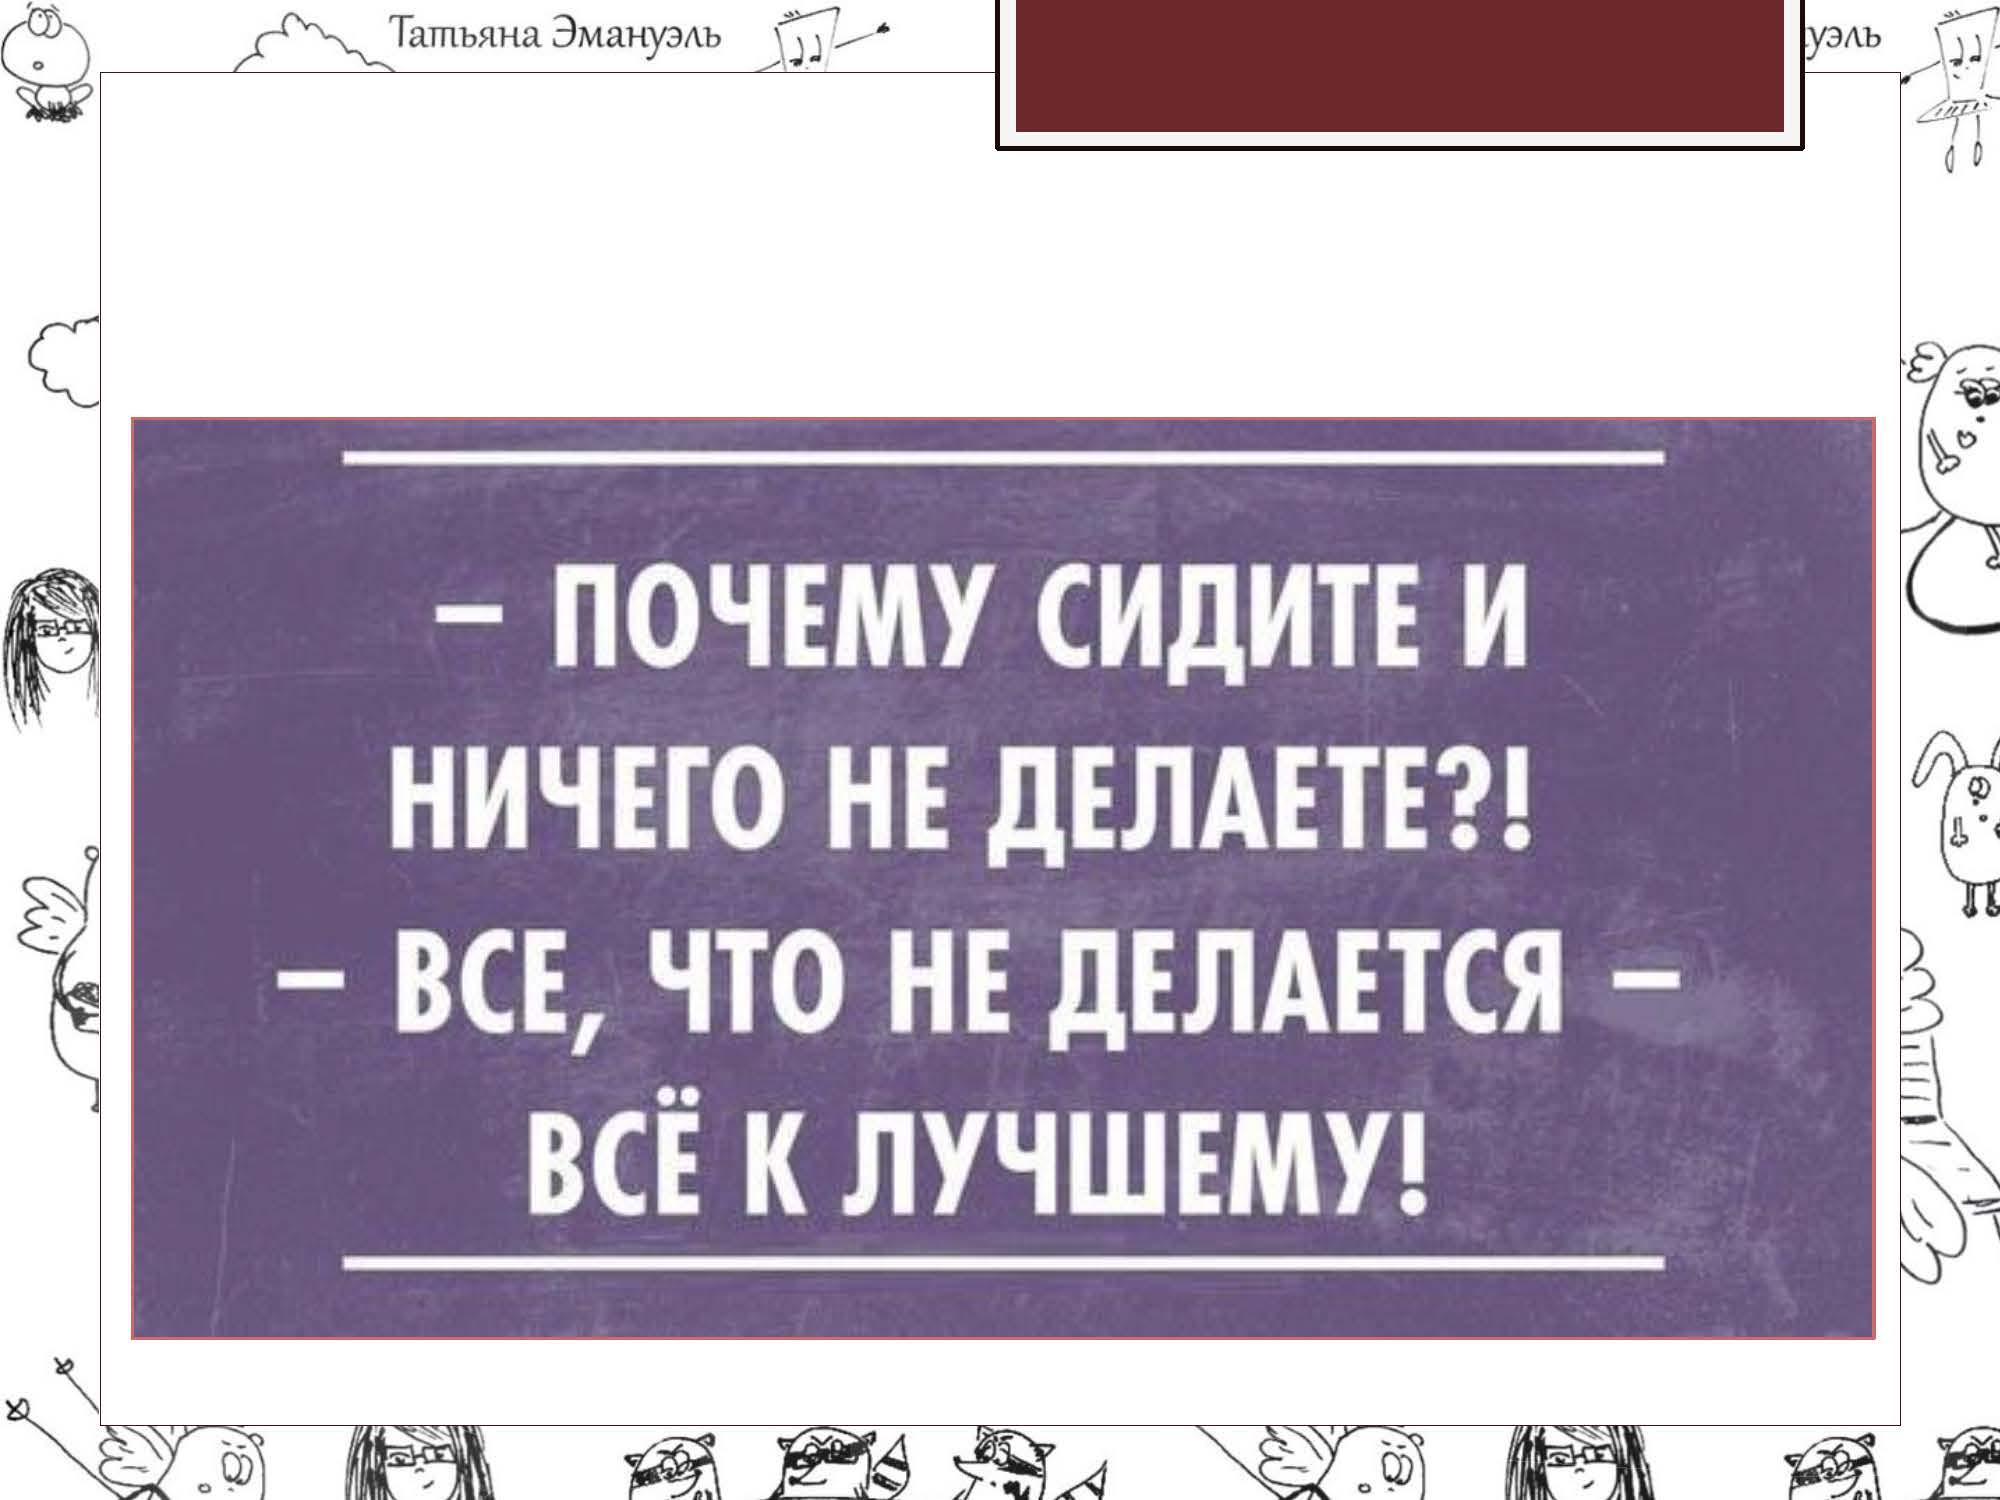 06 февраля эмануэль_Страница_057